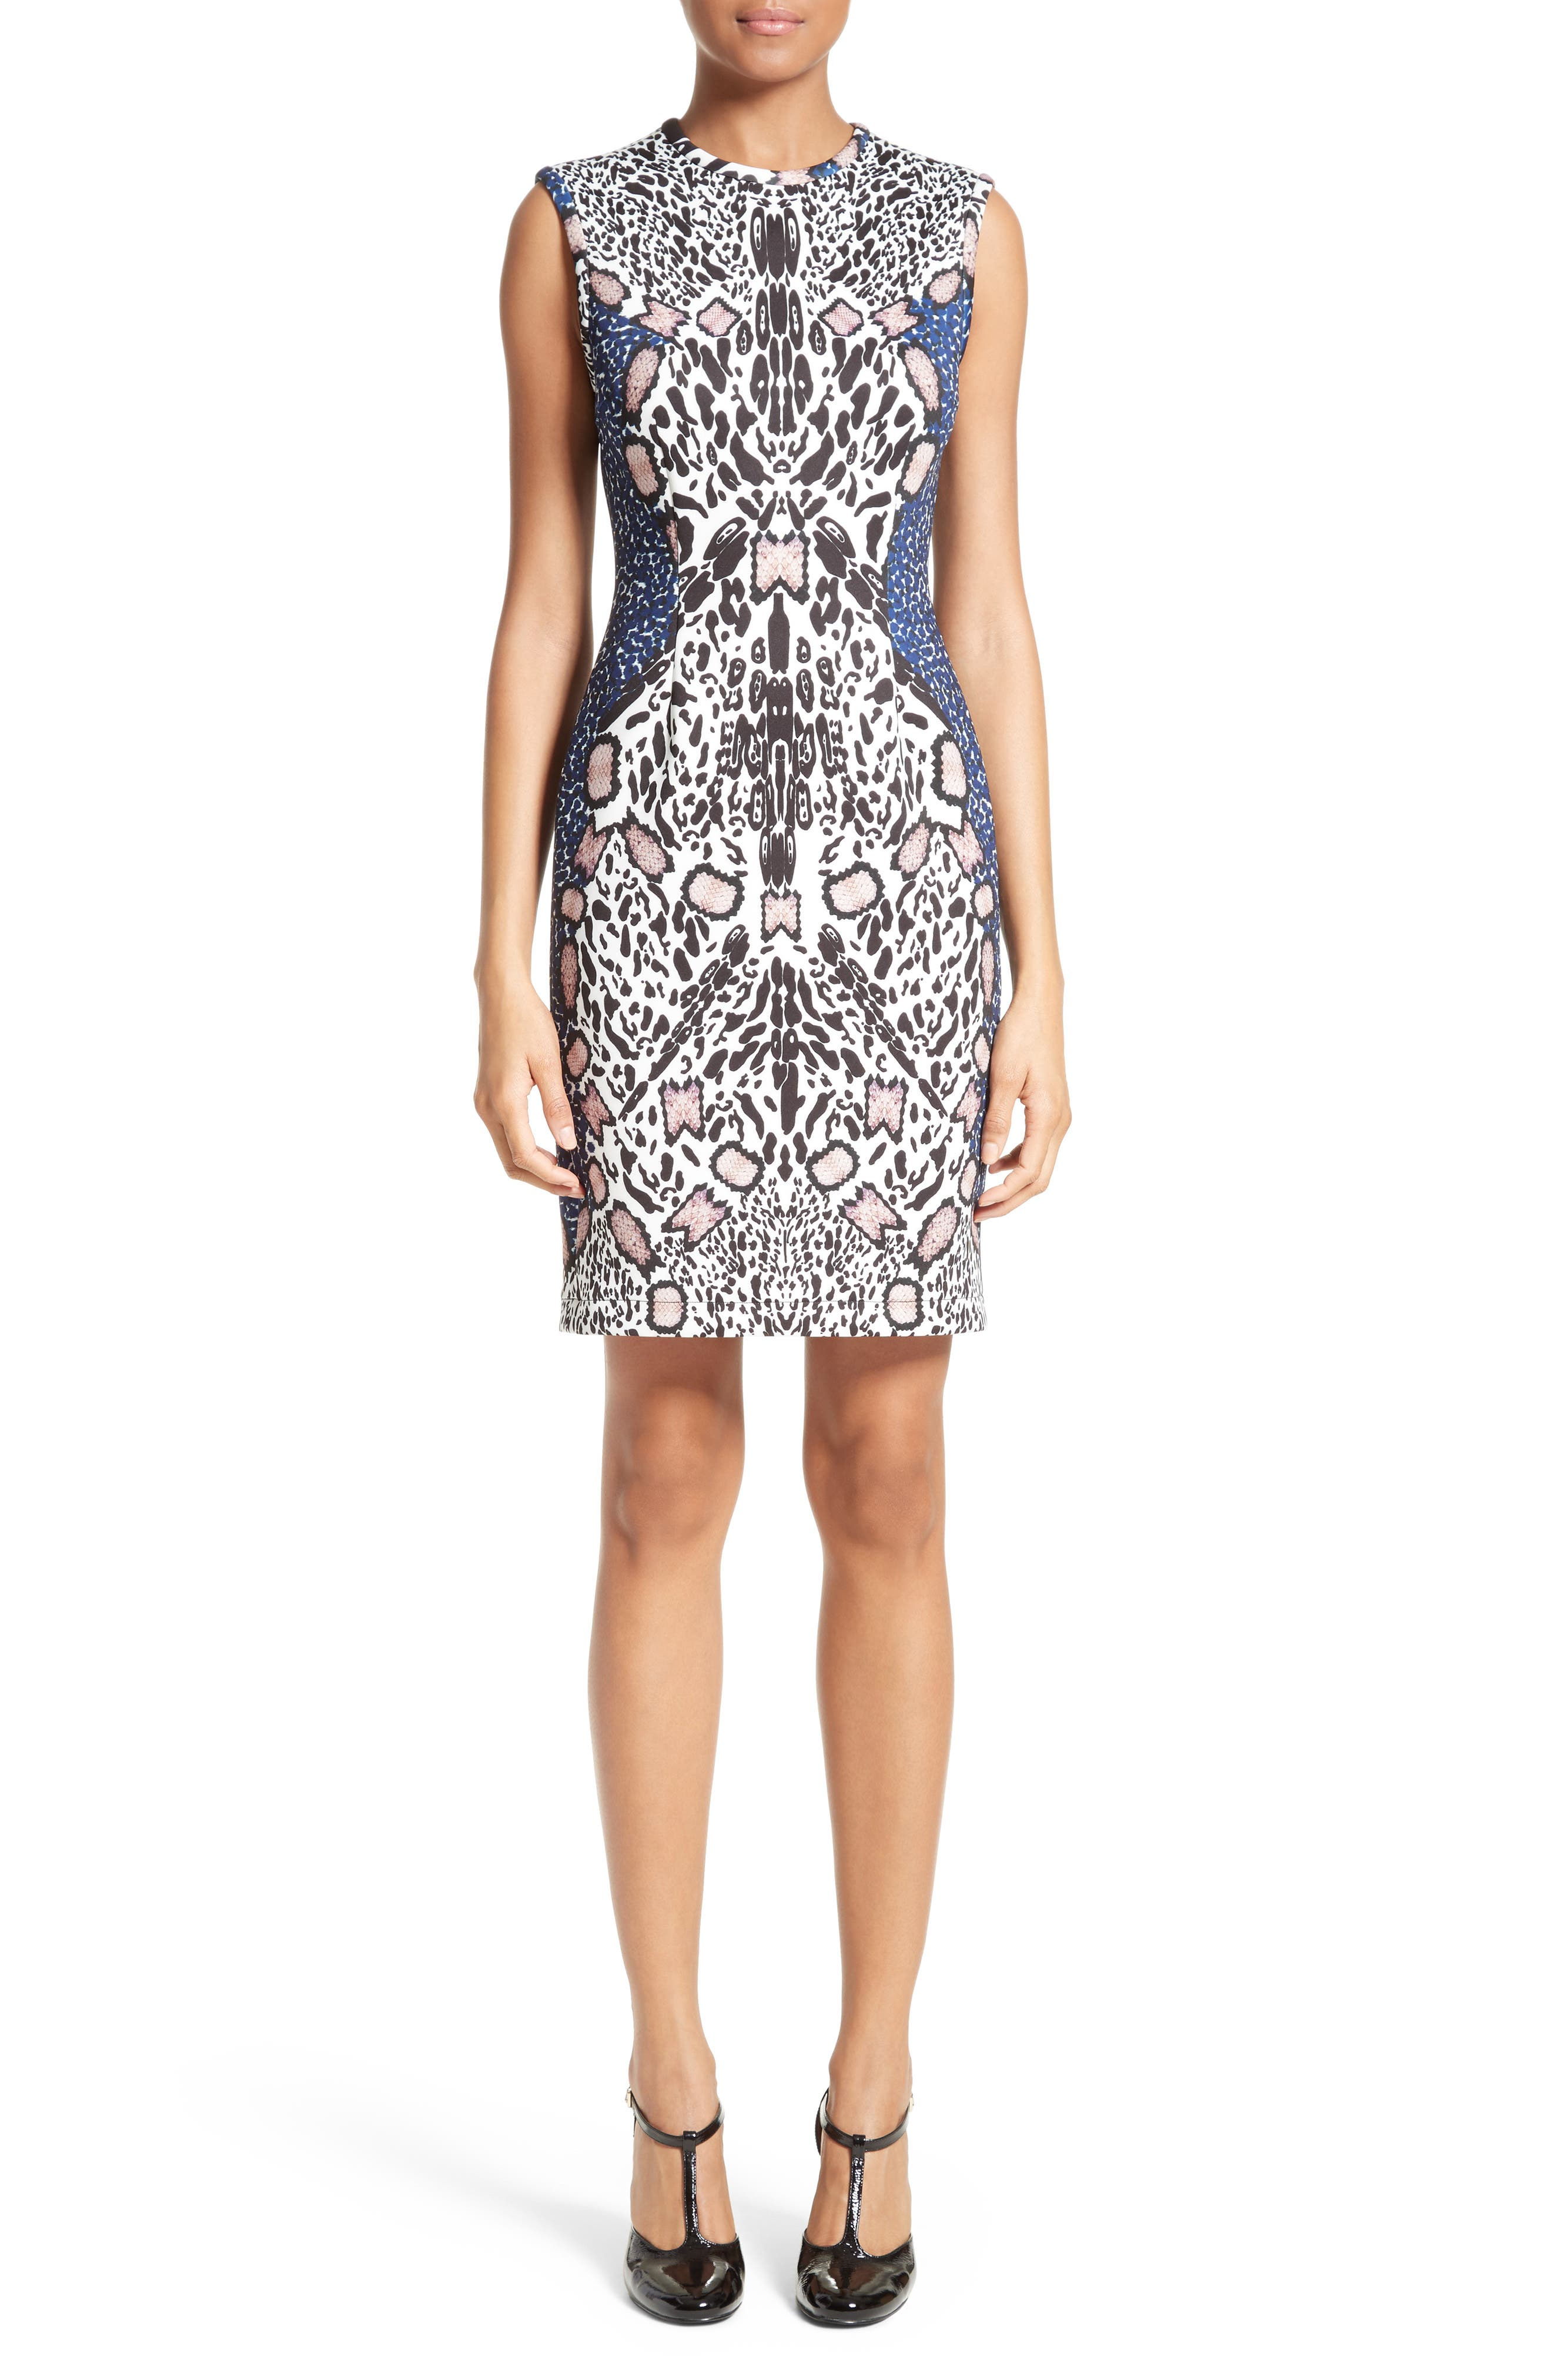 Cheetah Neoprene Sheath Dress,                             Main thumbnail 1, color,                             002